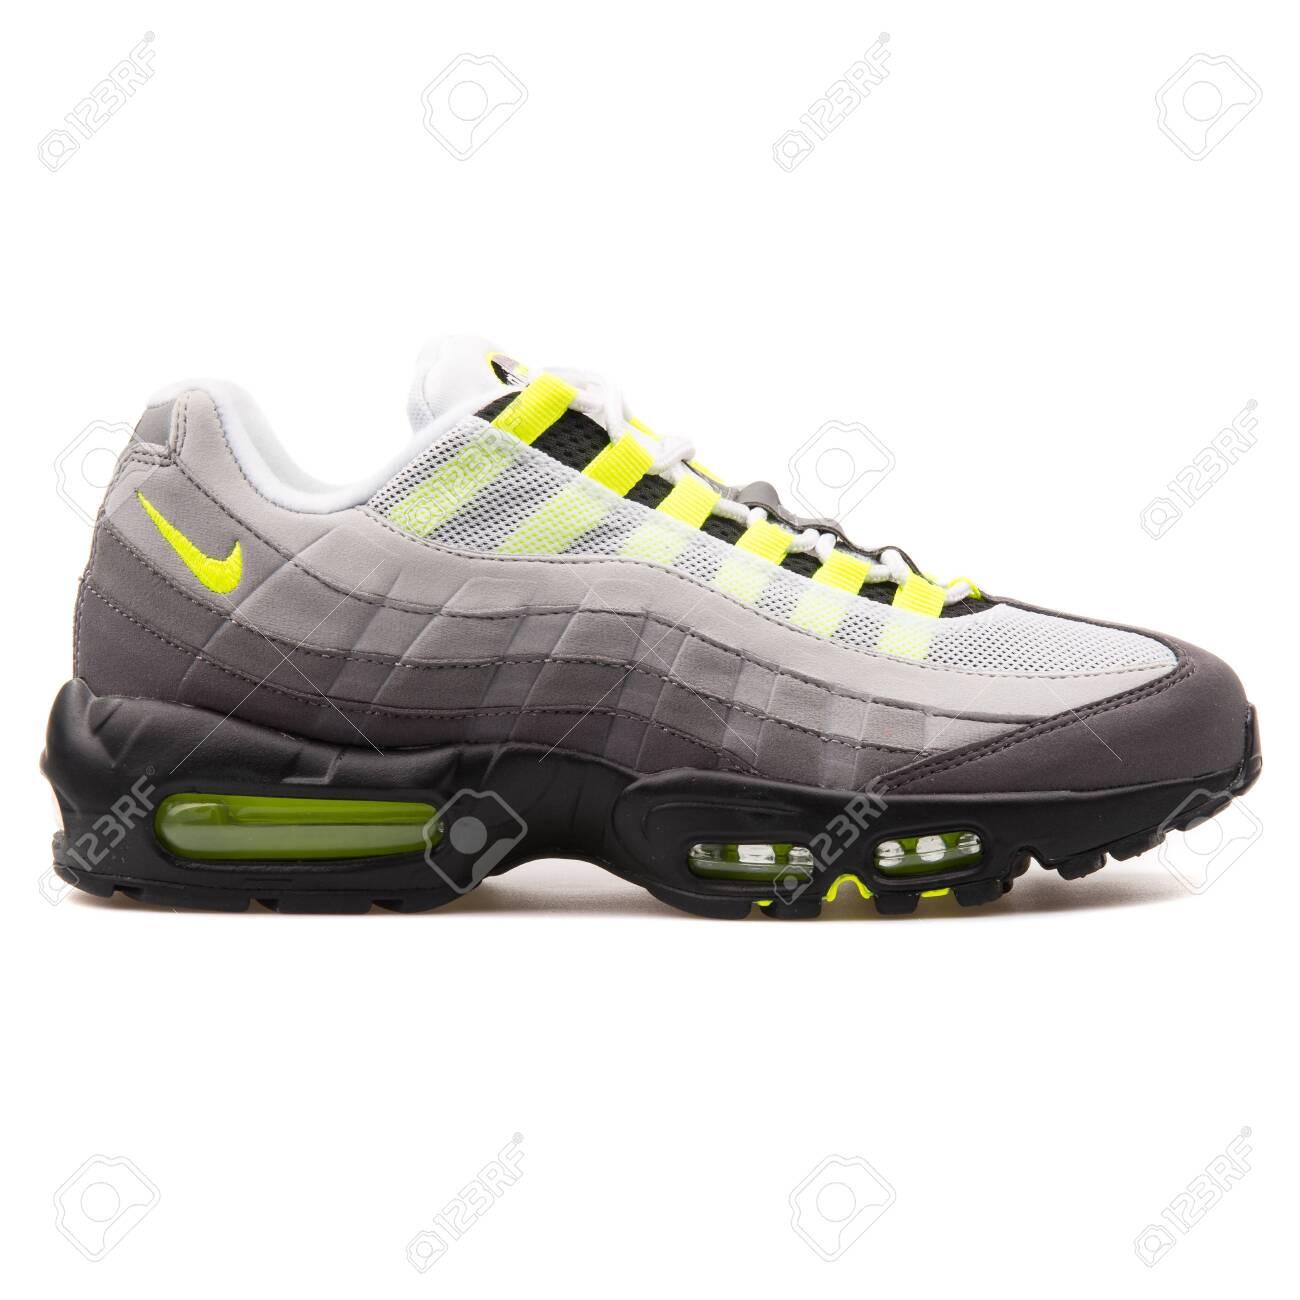 best value 3ab77 831c5 VIENNA, AUSTRIA - AUGUST 25, 2017: Nike Air Max 95 OG grey, black..